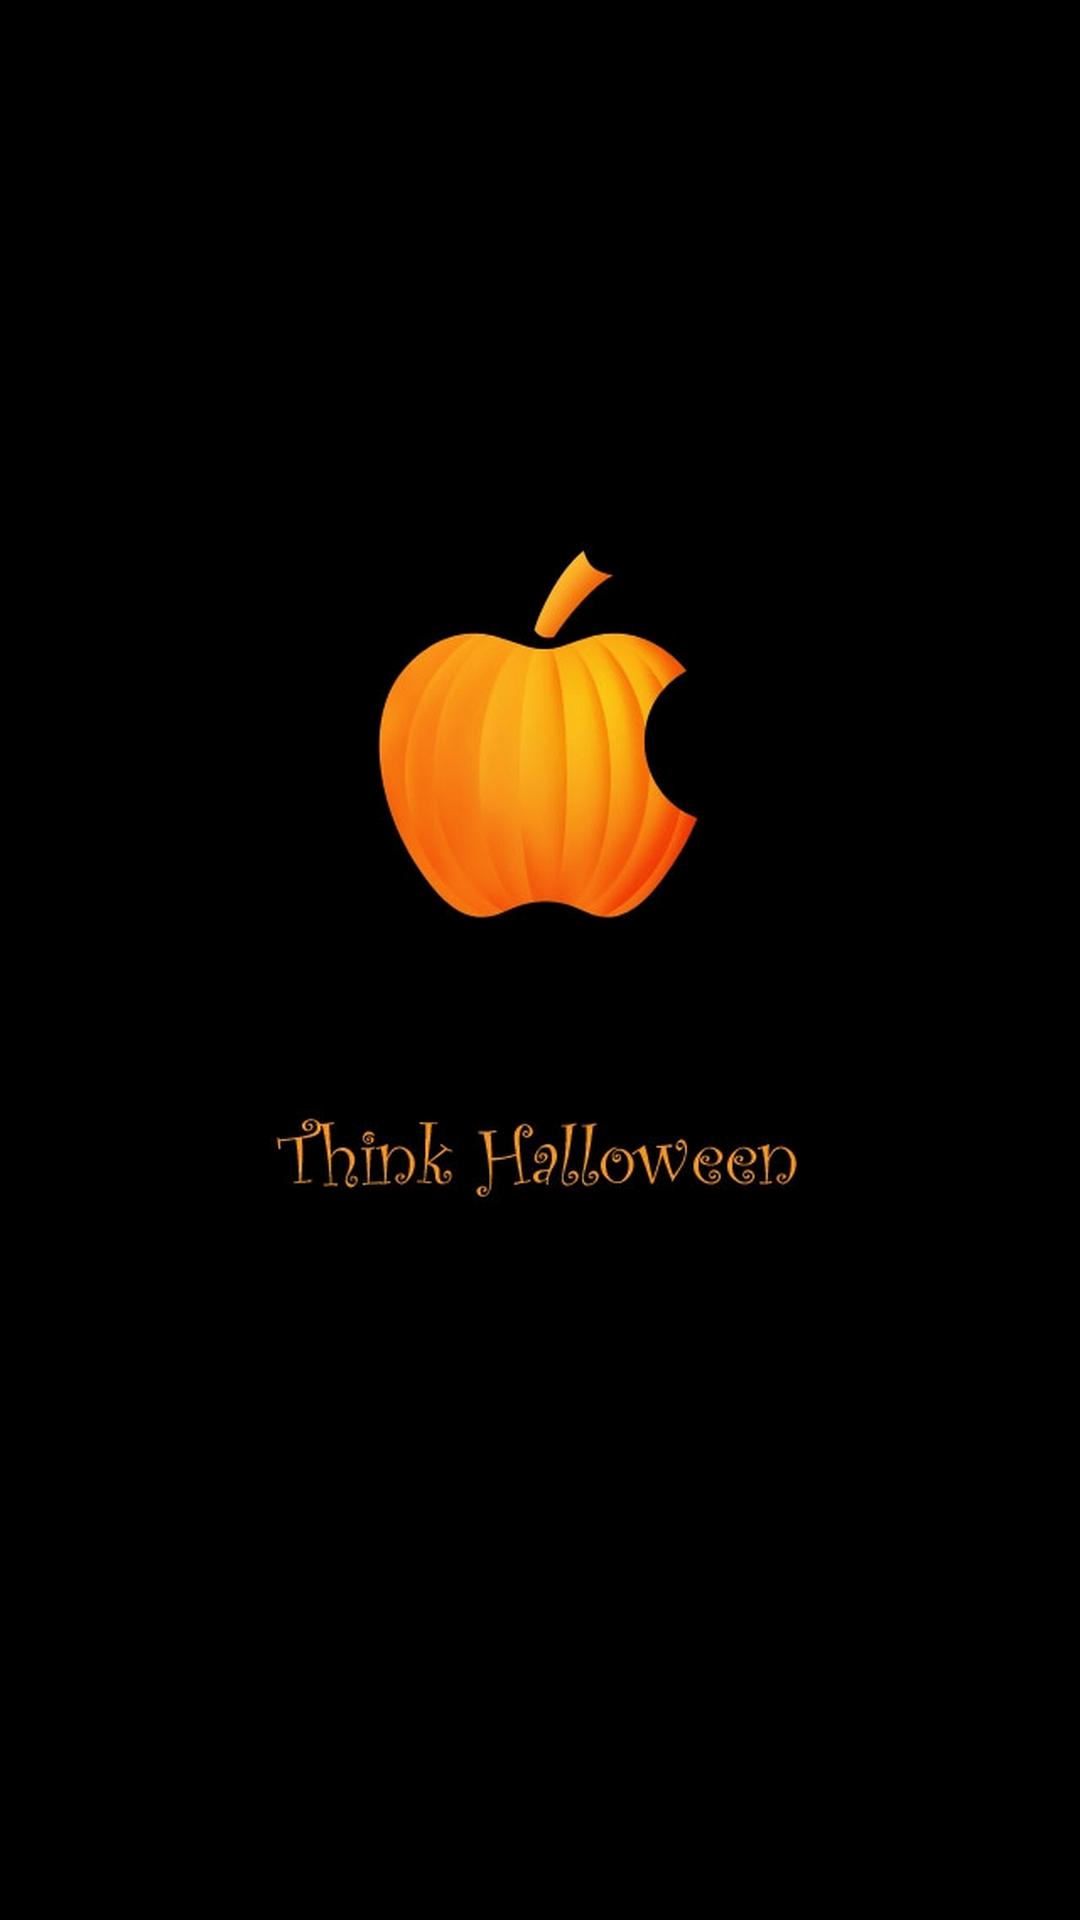 Appleのロゴ風ハロウィン壁紙 ハロウィン壁紙 ハロウィングッズ